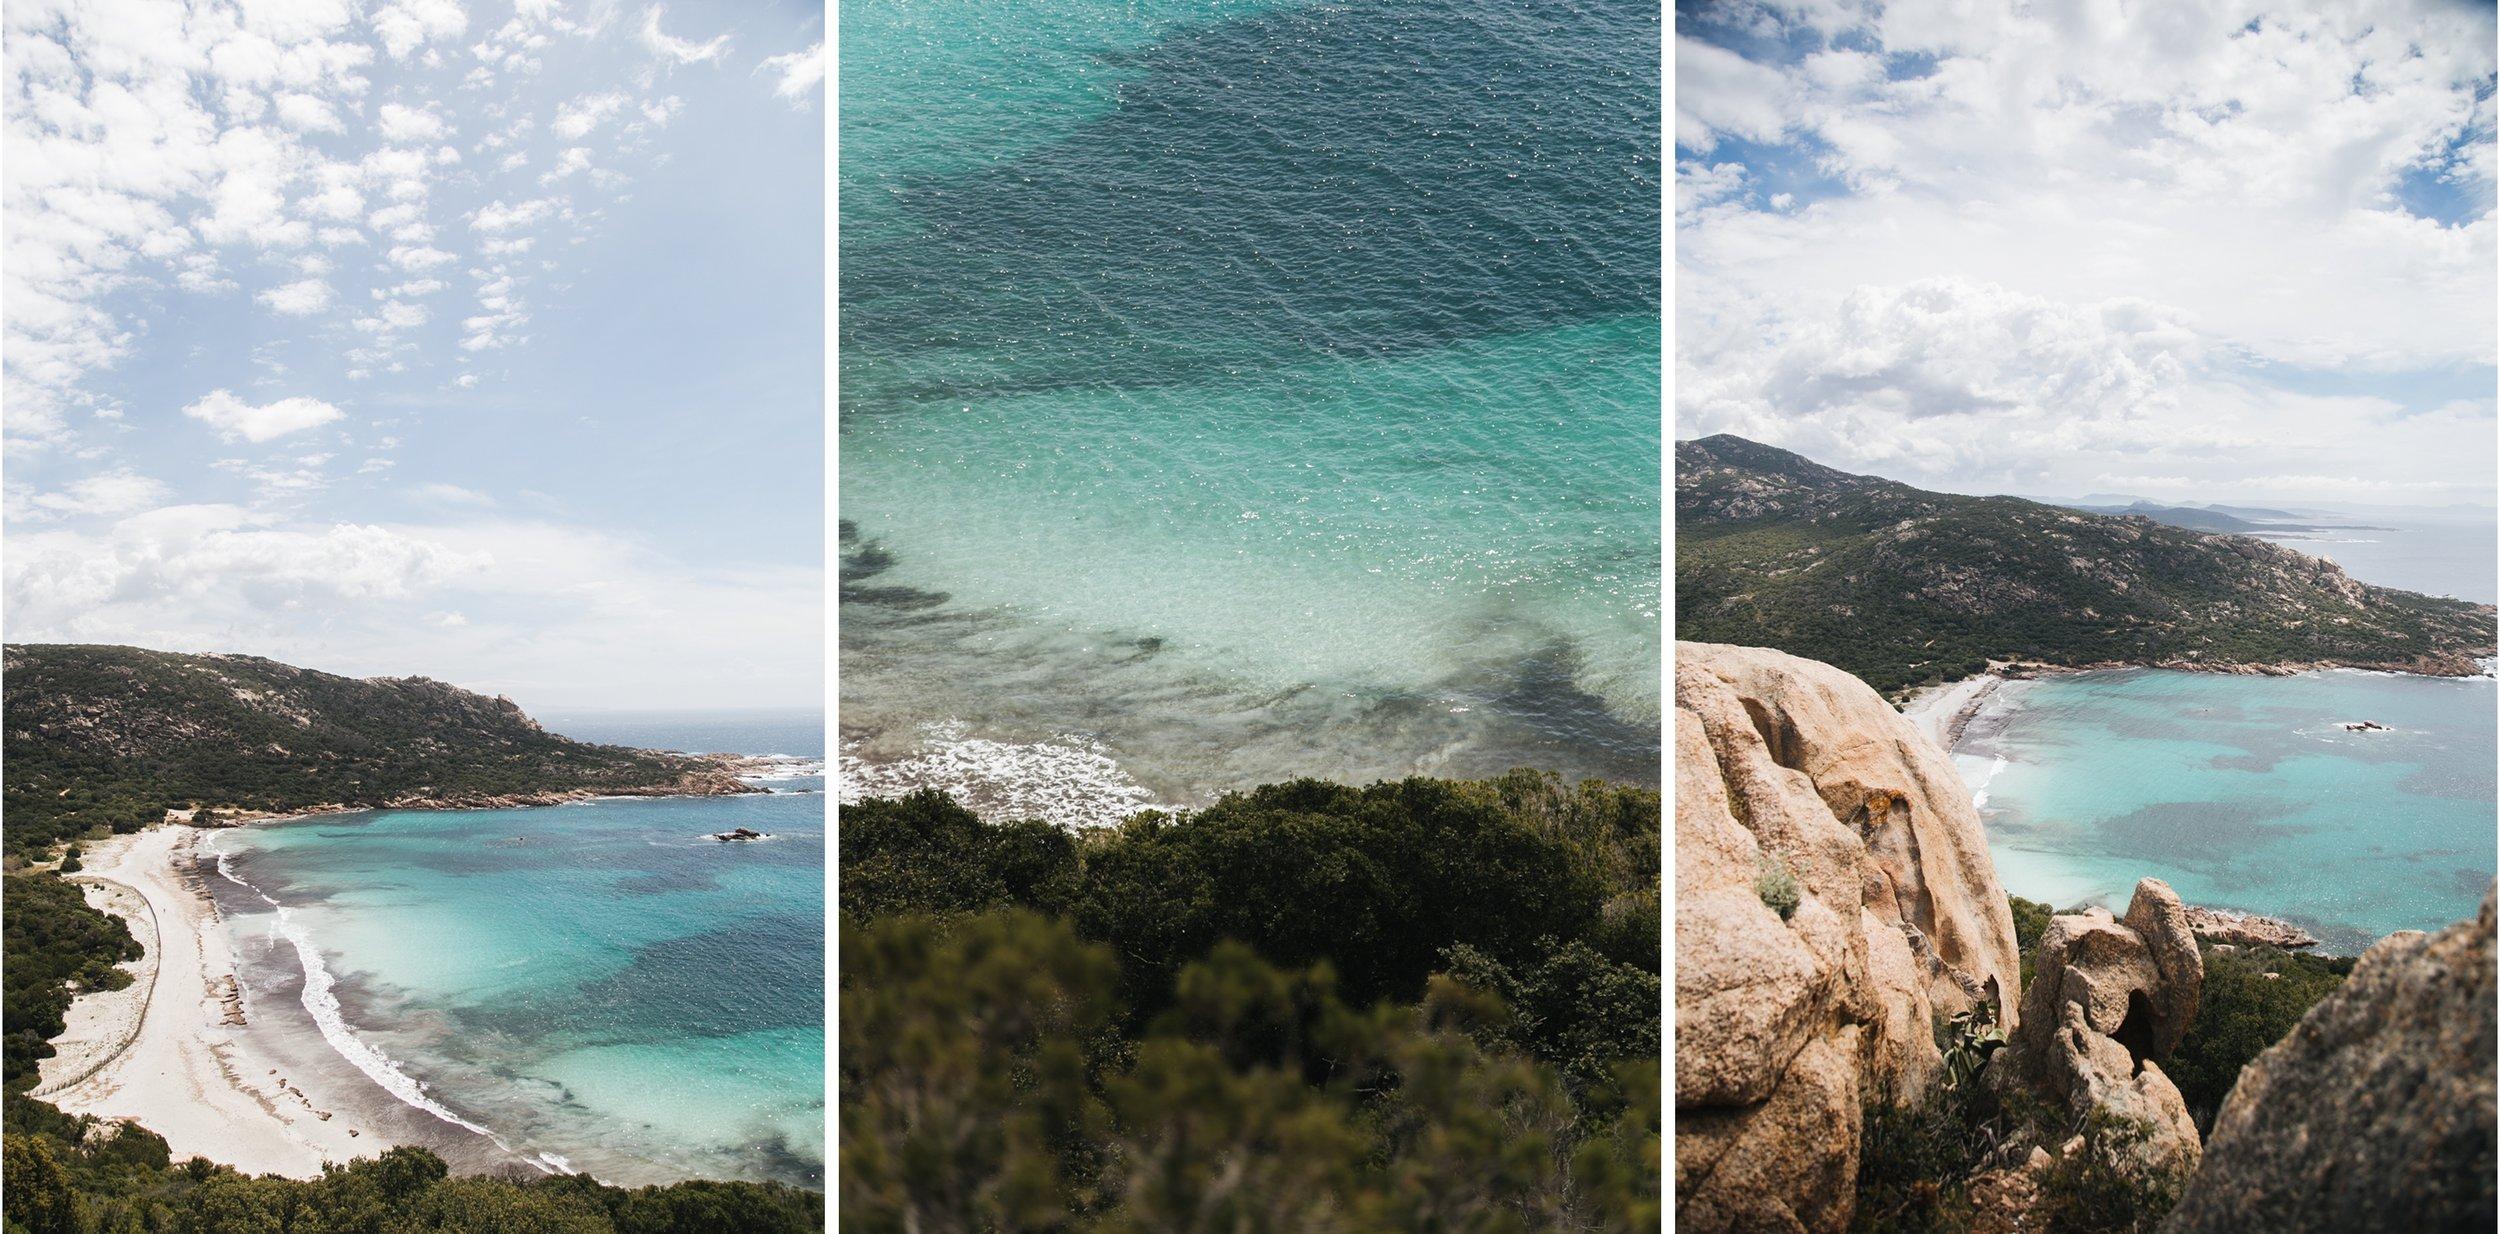 Roccapina-plage-tour-randonnee-corse.jpg